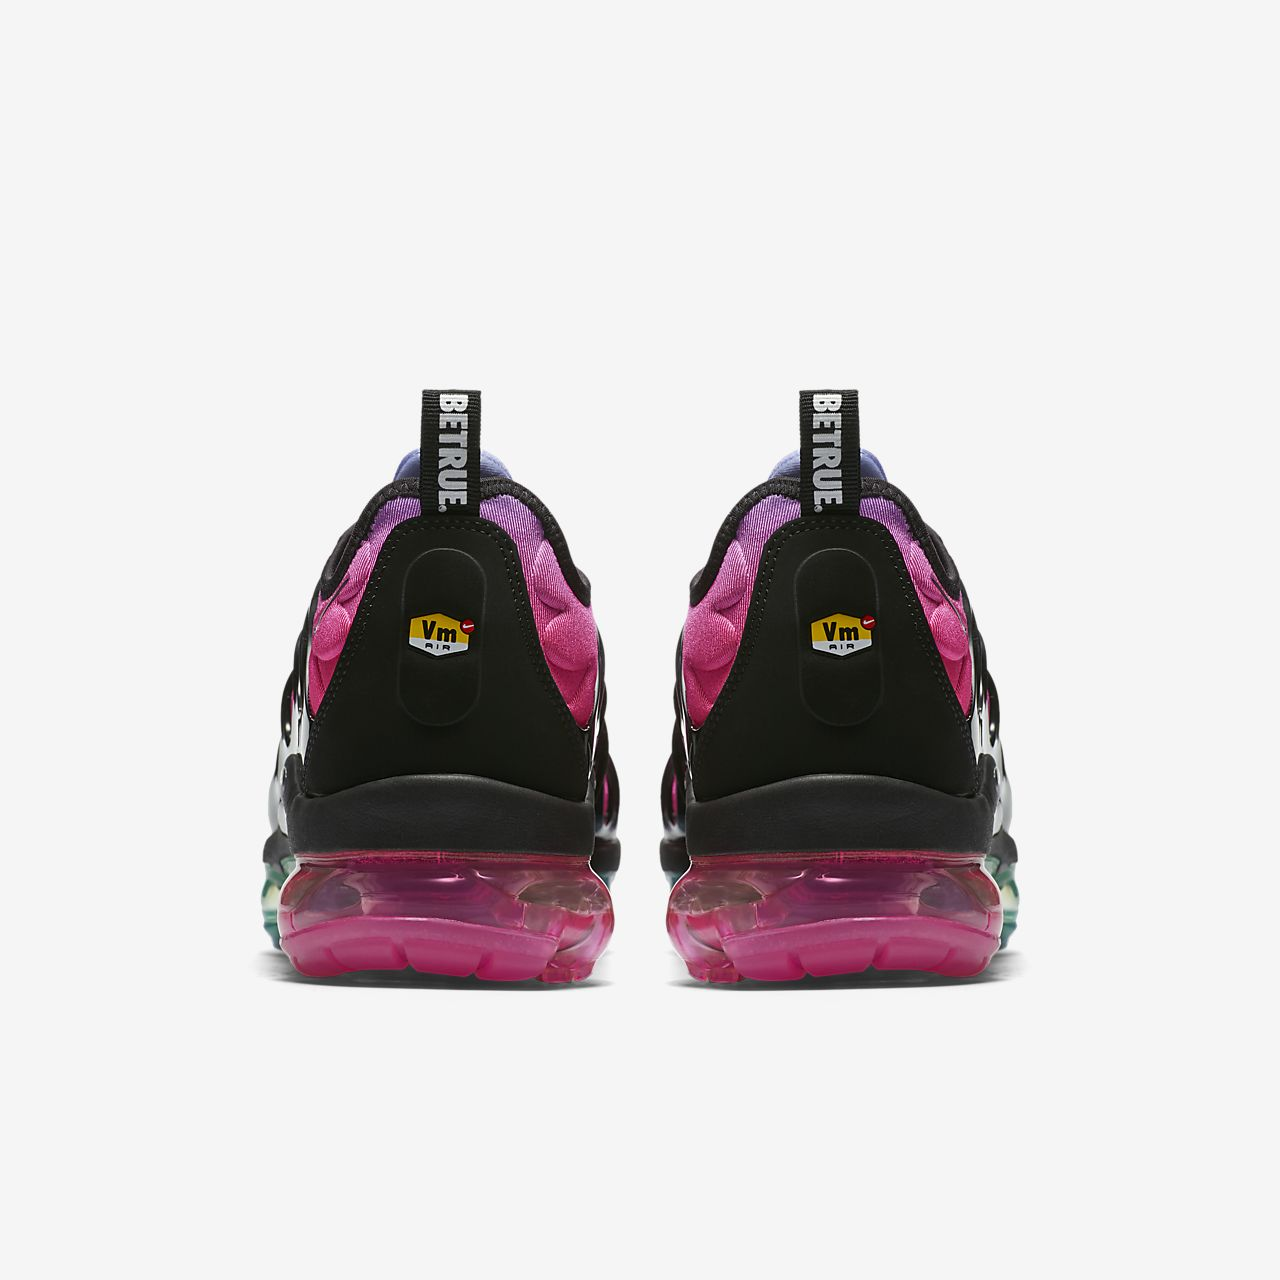 3b9ae5765c339 Nike Air VaporMax Plus BETRUE Men s Shoe. Nike.com AU